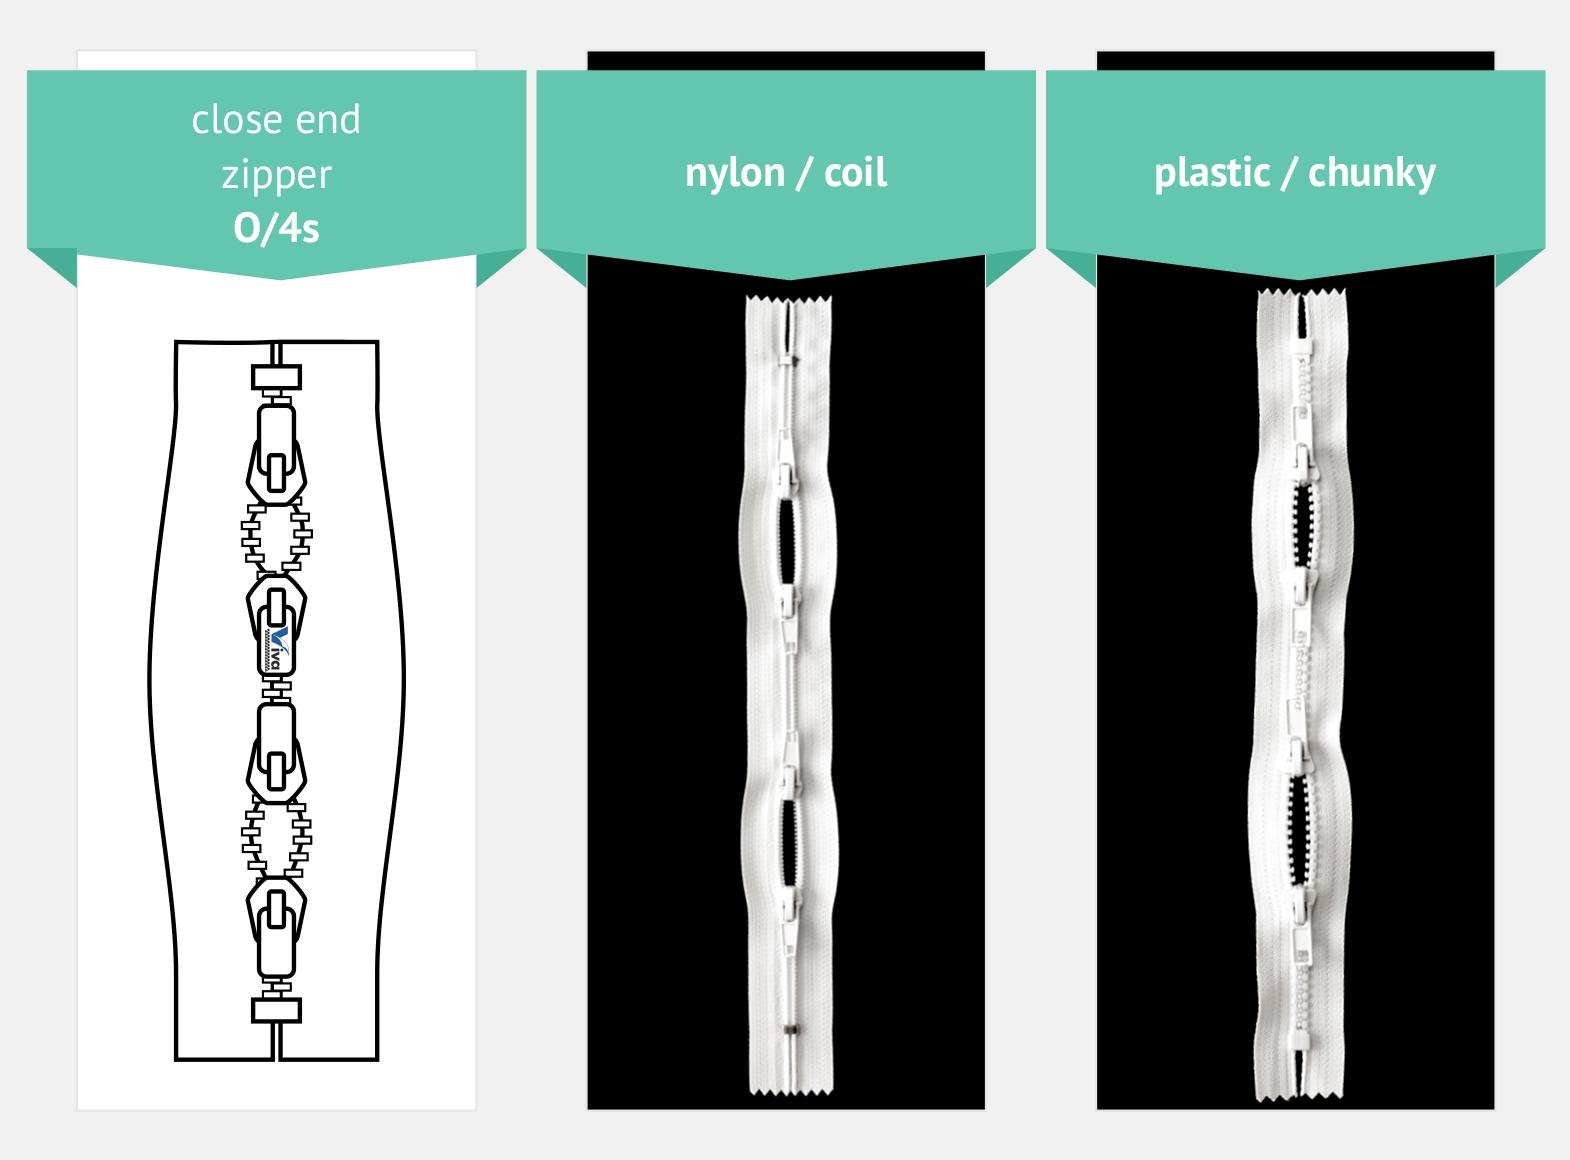 Zipper types close end O/4s